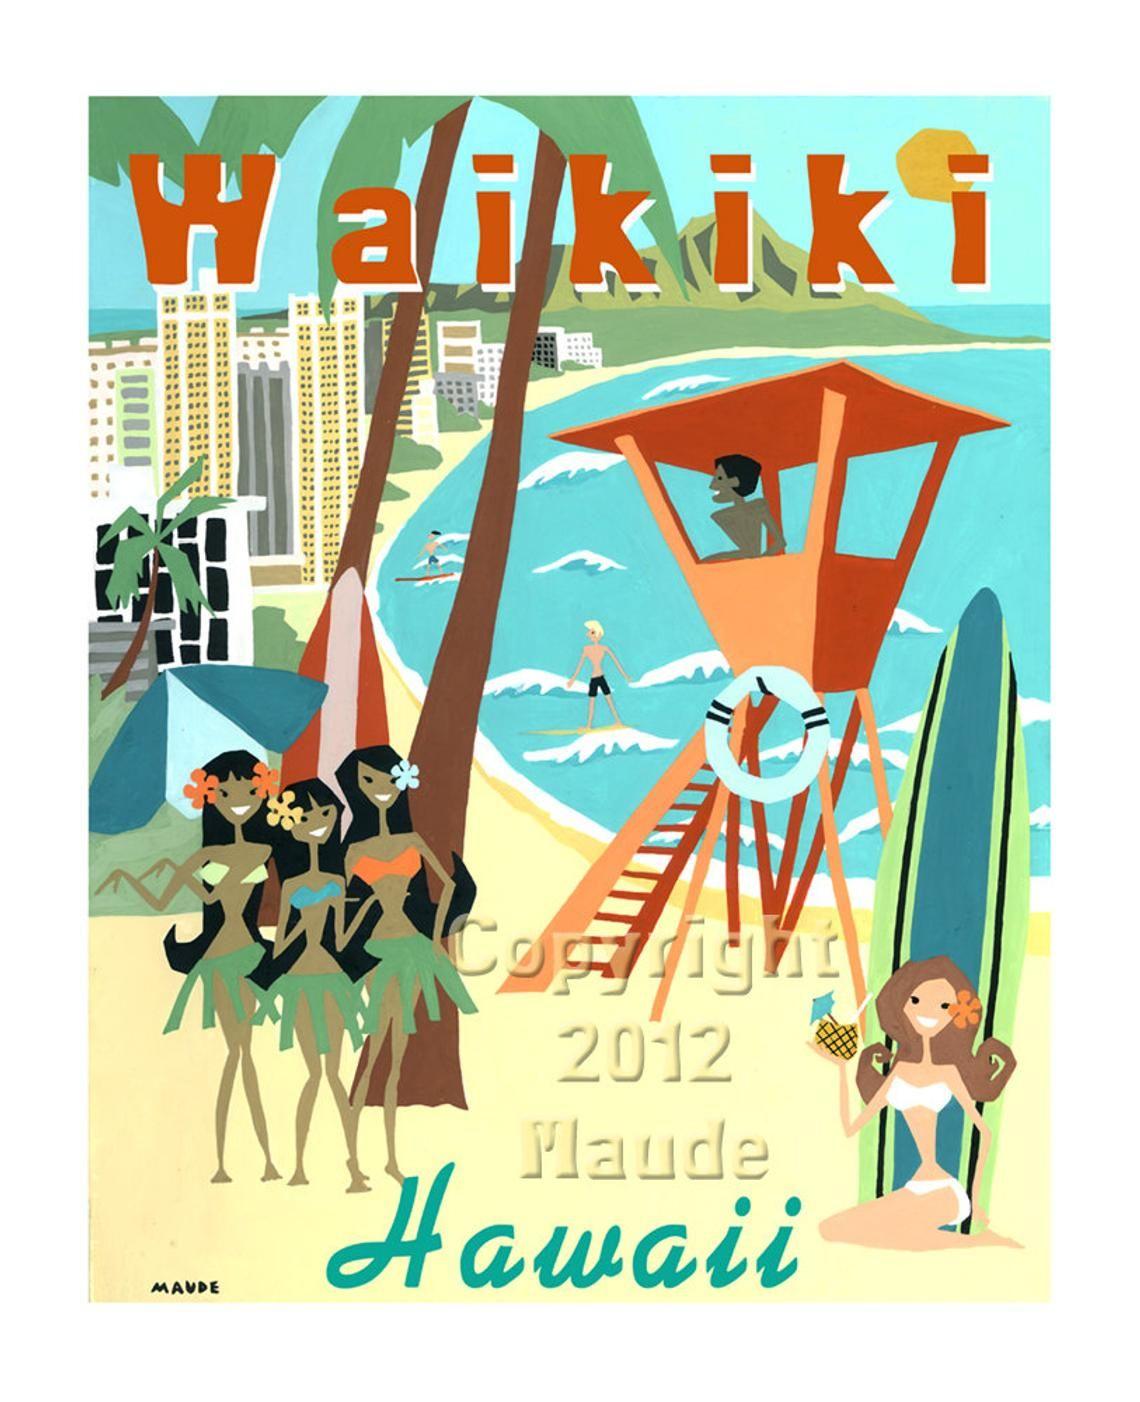 Hawaii Mid Century Modern Tiki Art Print Wikiki Beach Travel Poster Retro Vintage Style Painting Large And Xl Mid Century Modern Art Print Retro Poster Tiki Art